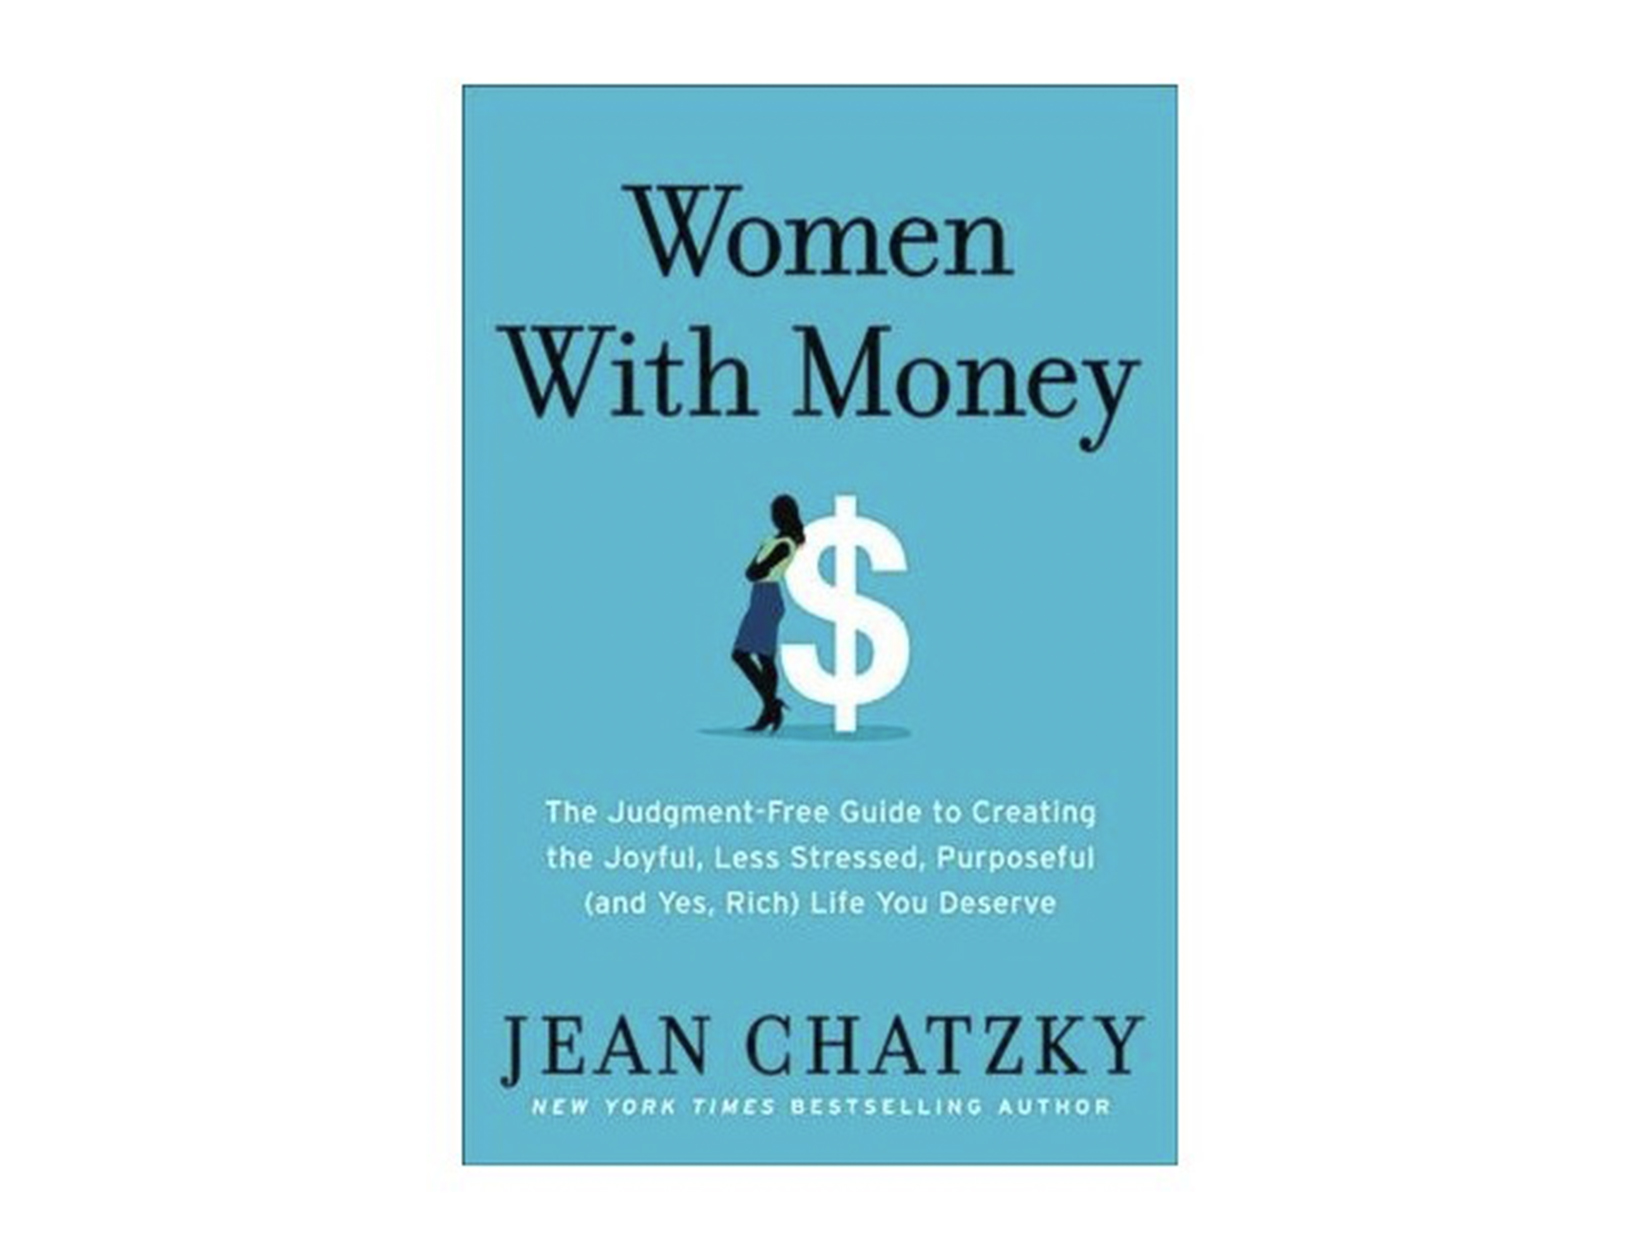 <em>Women with Money</em> by Jean Chatzky